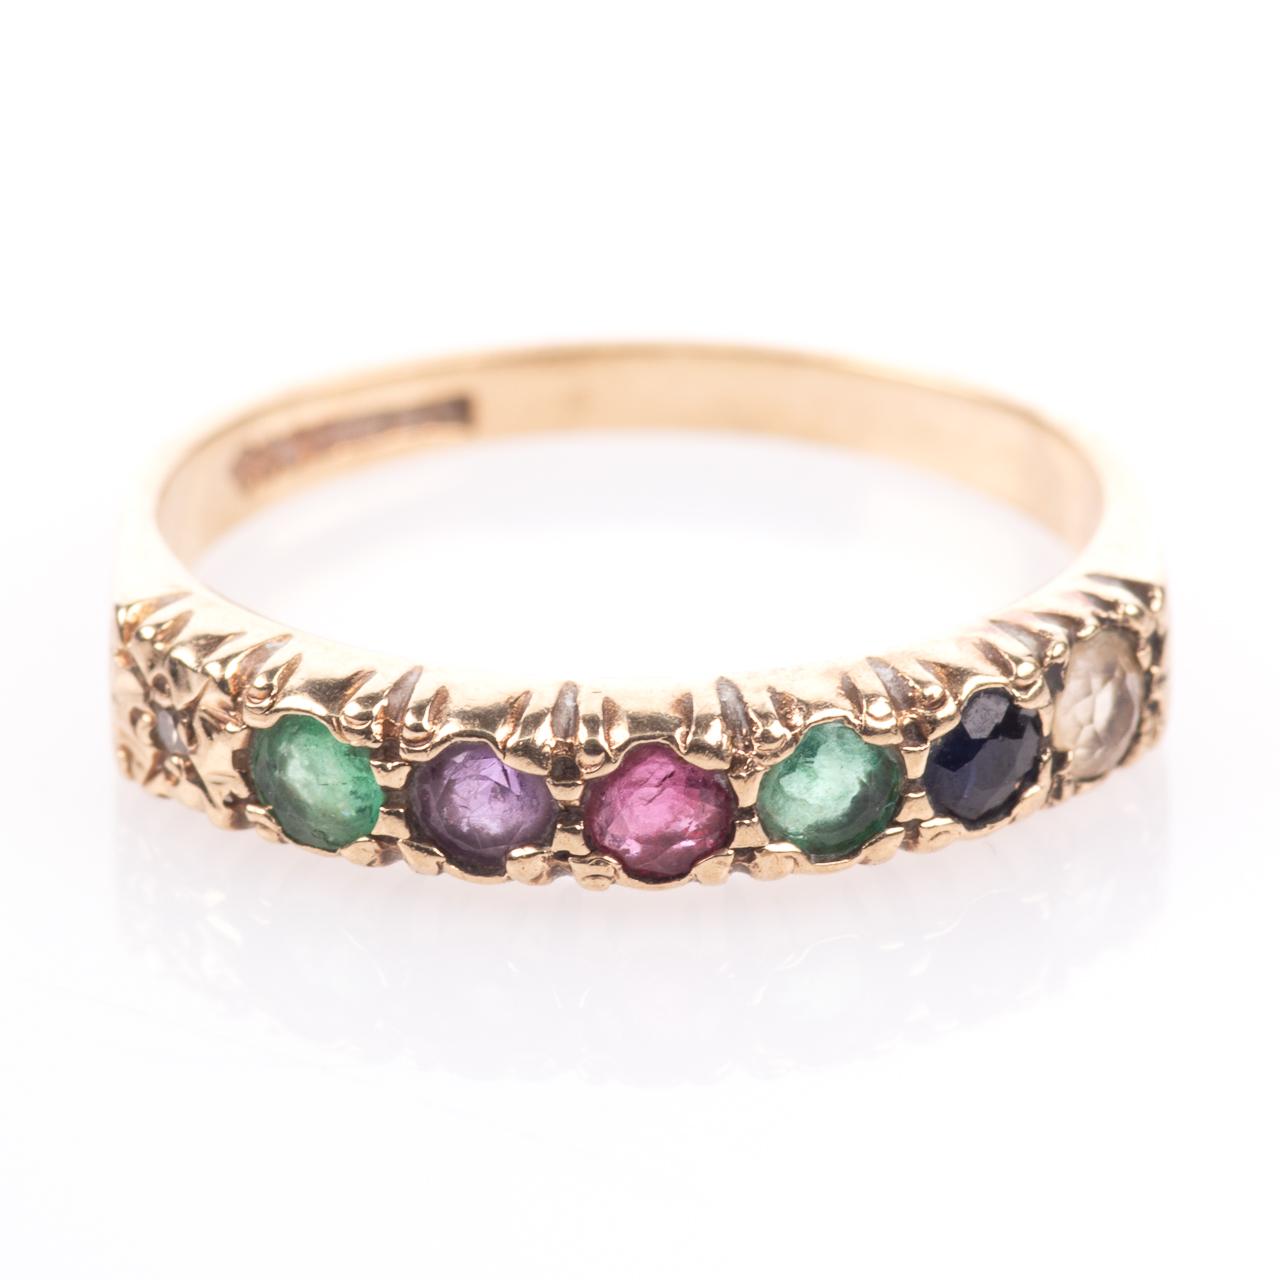 9ct Gold Emerald, Ruby, Amethyst, Sapphire & Diamond Ring - Image 3 of 8